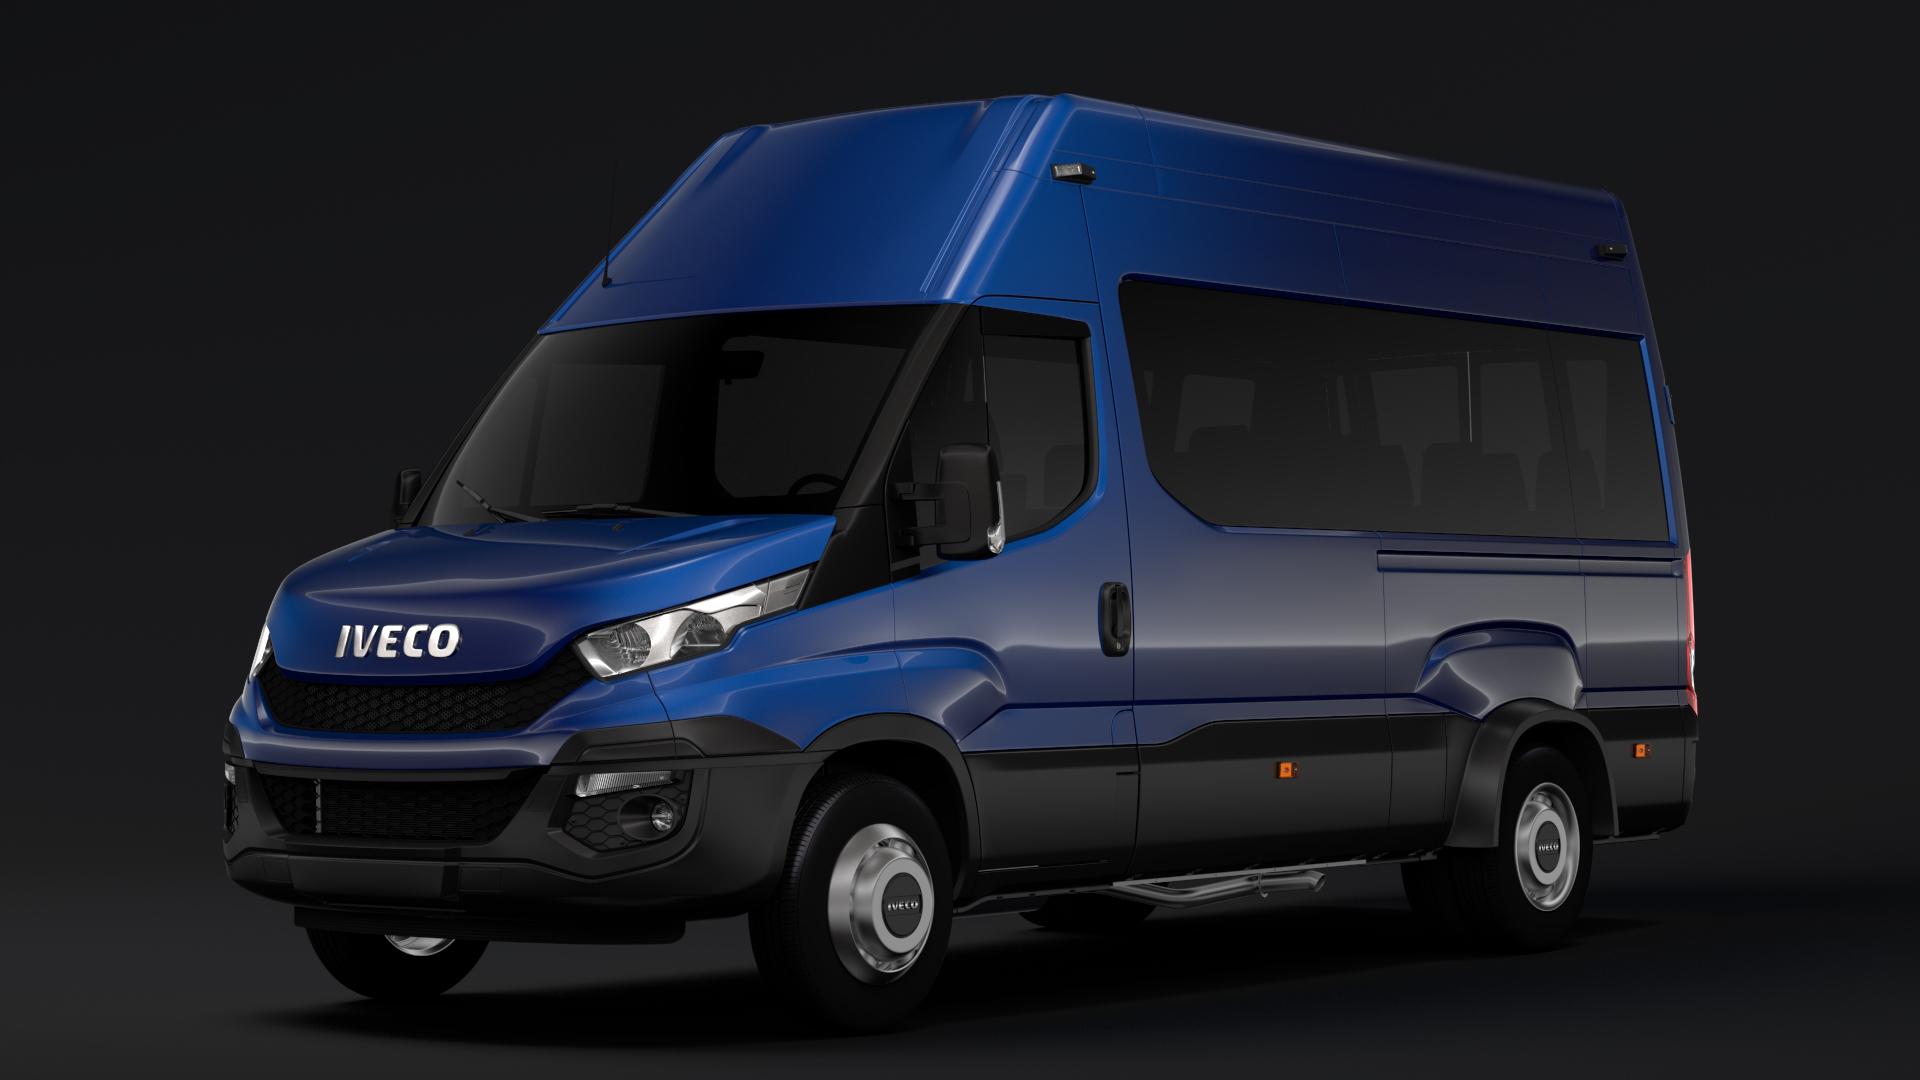 iveco daily minibus l3h3 2014 2016 3d model max fbx c4d lwo ma mb hrc xsi obj 276110